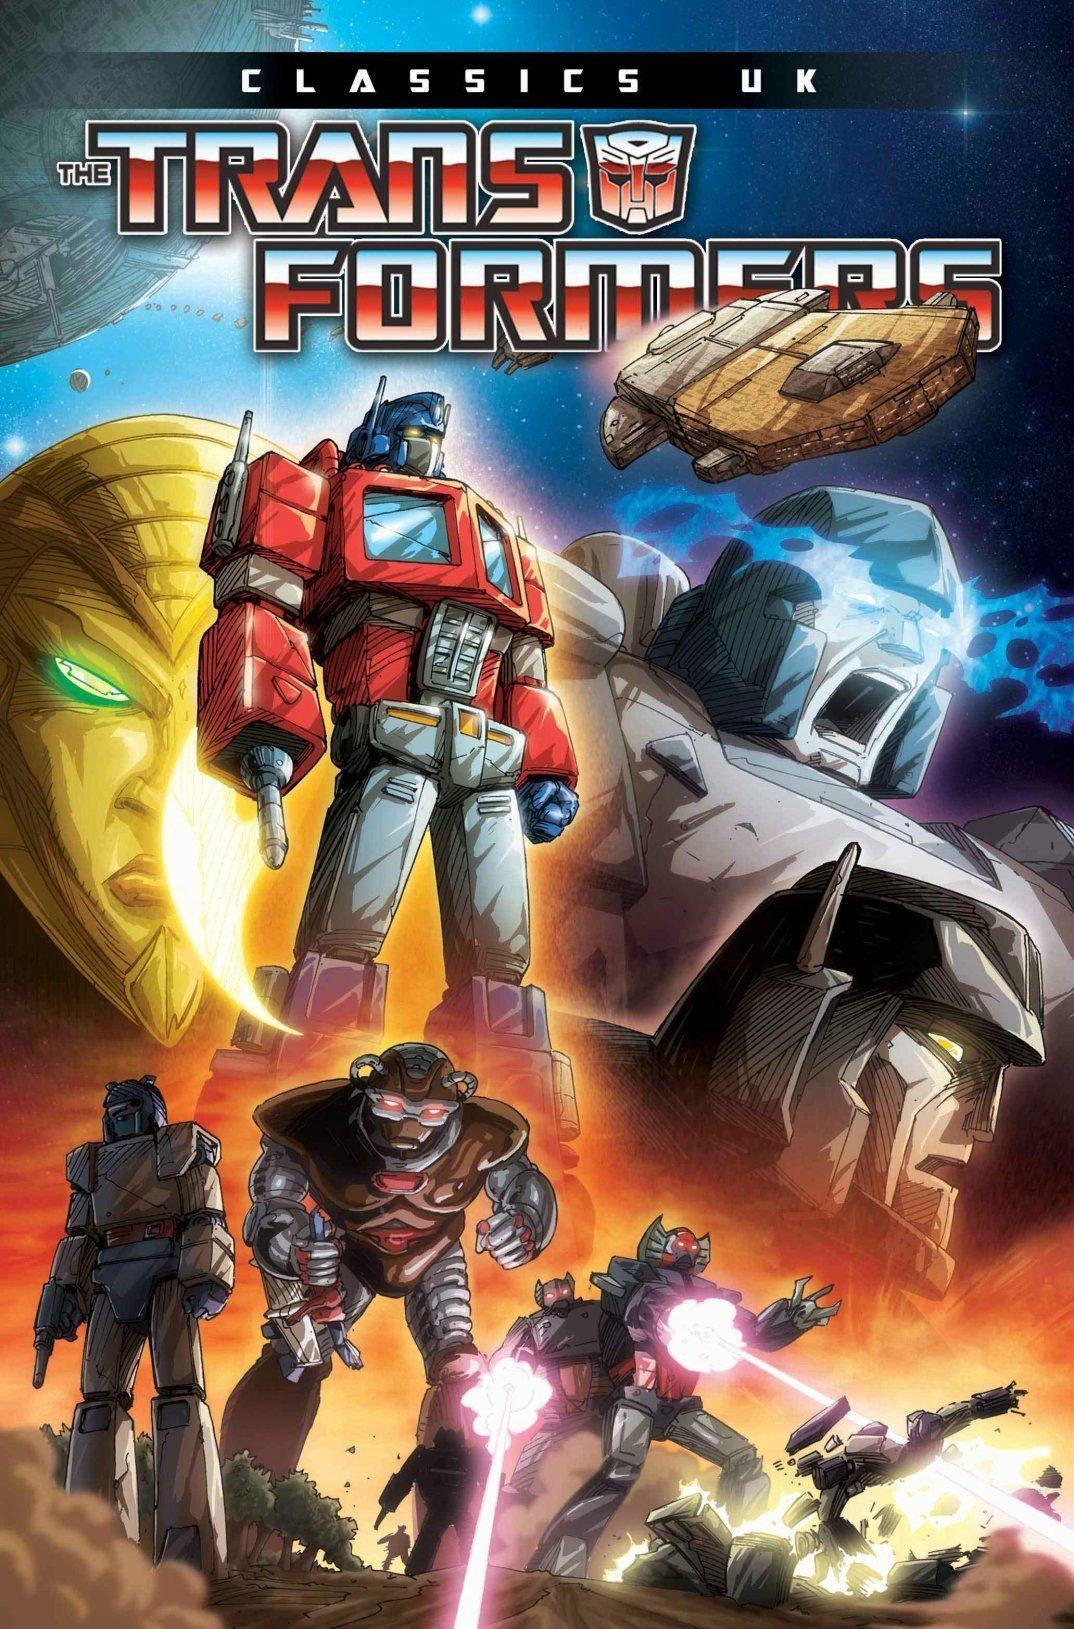 Read Online Transformers Classics UK Volume 1 ebook